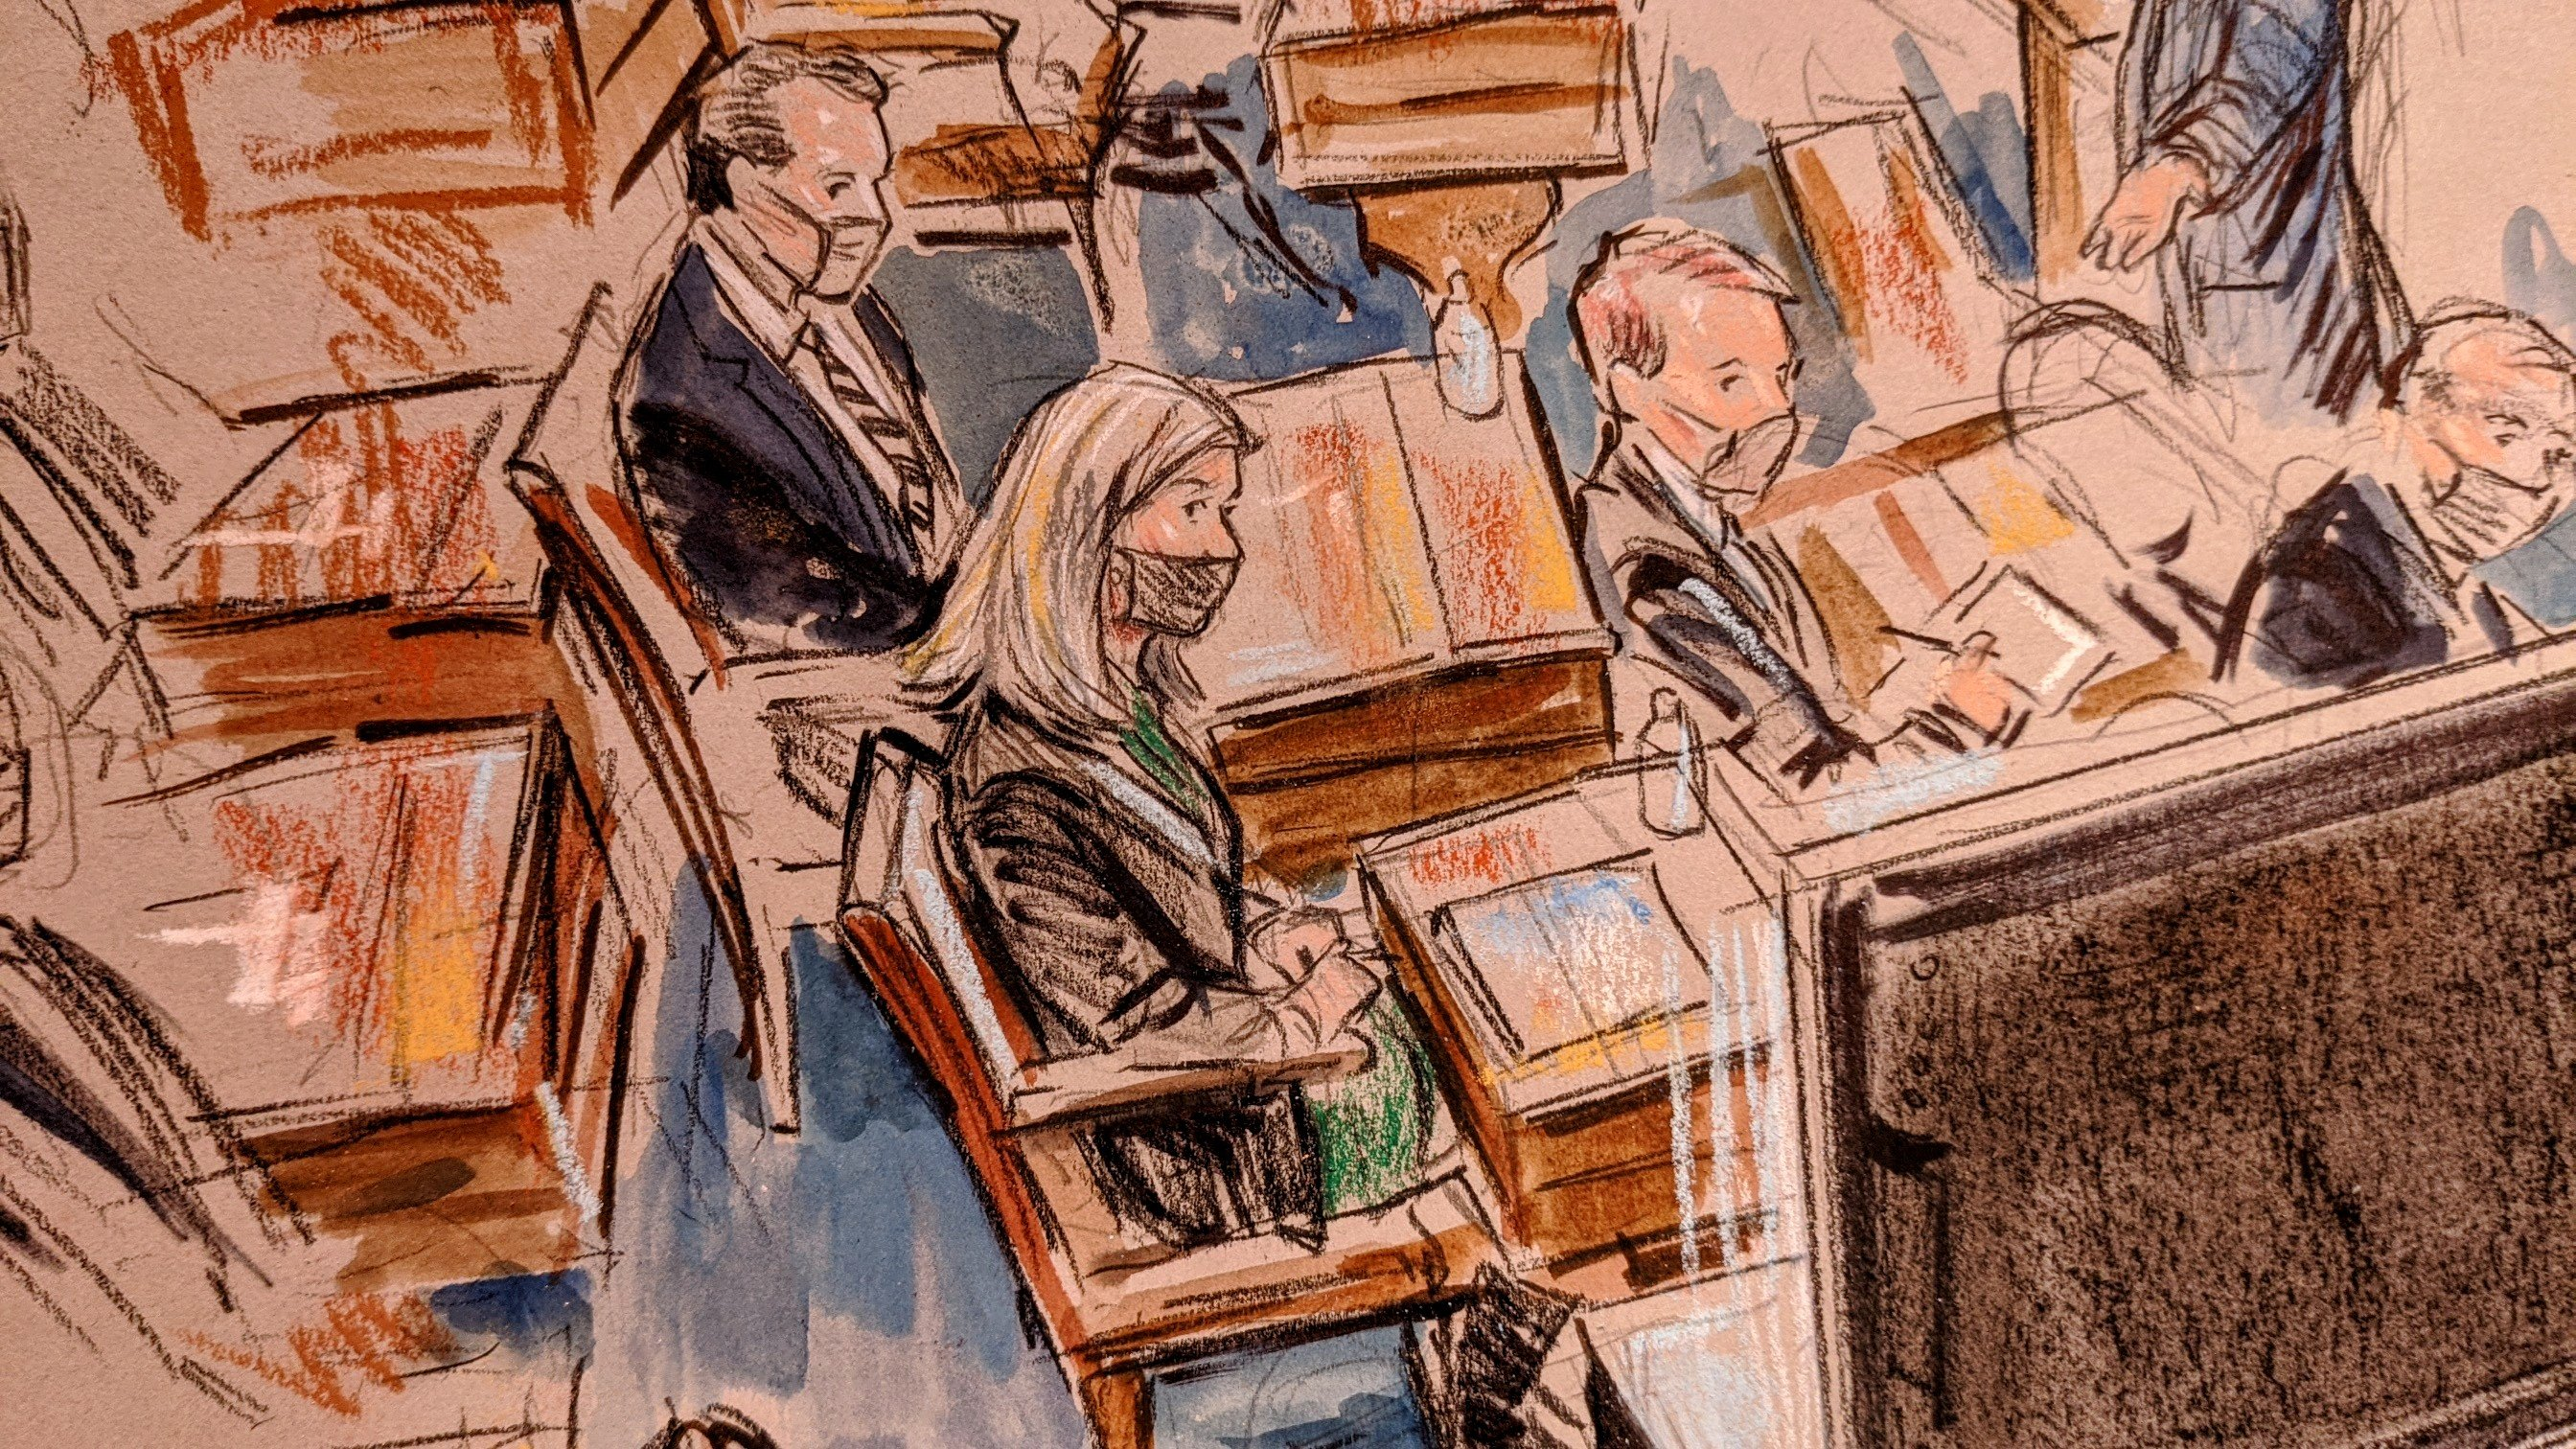 Senators listen during the Senate impeachment trial of former President Trump, on February 10, 2021.